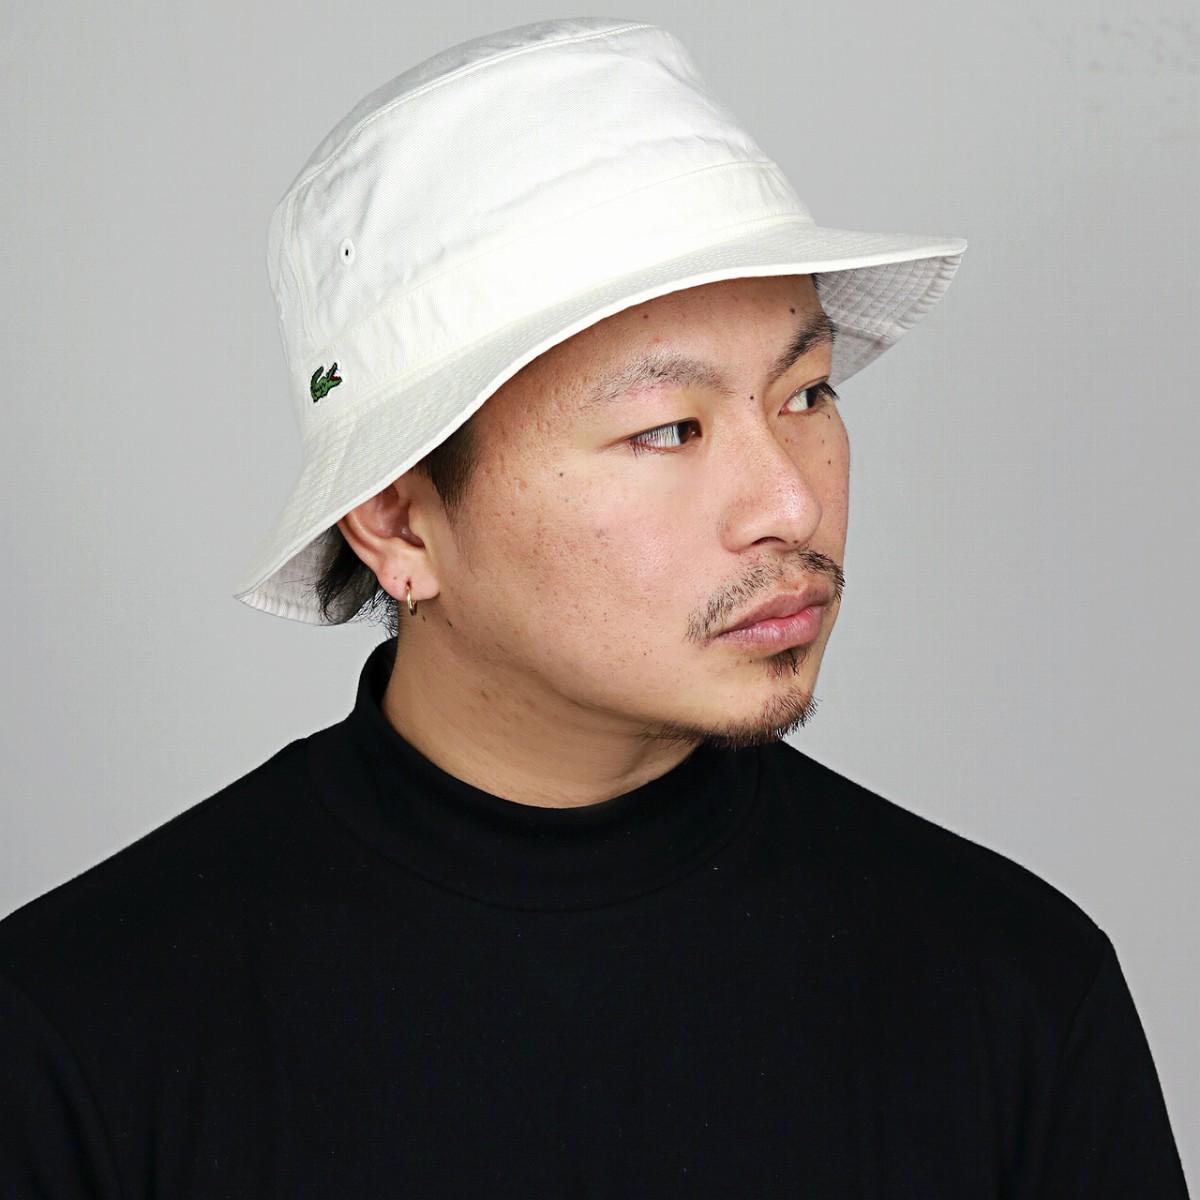 62702711 ELEHELM HAT STORE: LACOSTE bucket Hat Lacoste Hat Safari Hat white ...